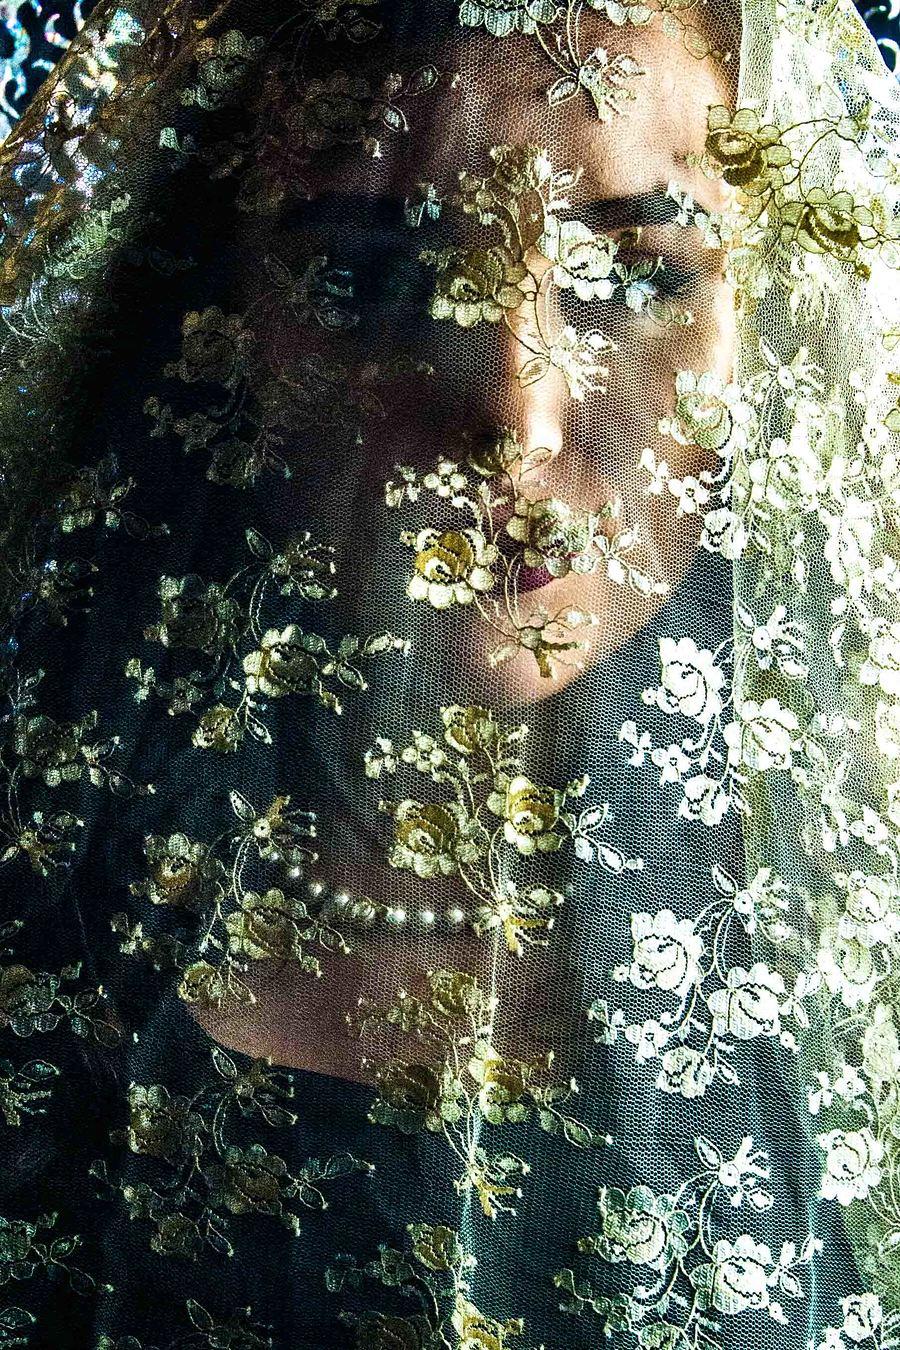 Photography by blured vision, Model alicemodelling / Uploaded 21st September 2019 @ 09:39 PM